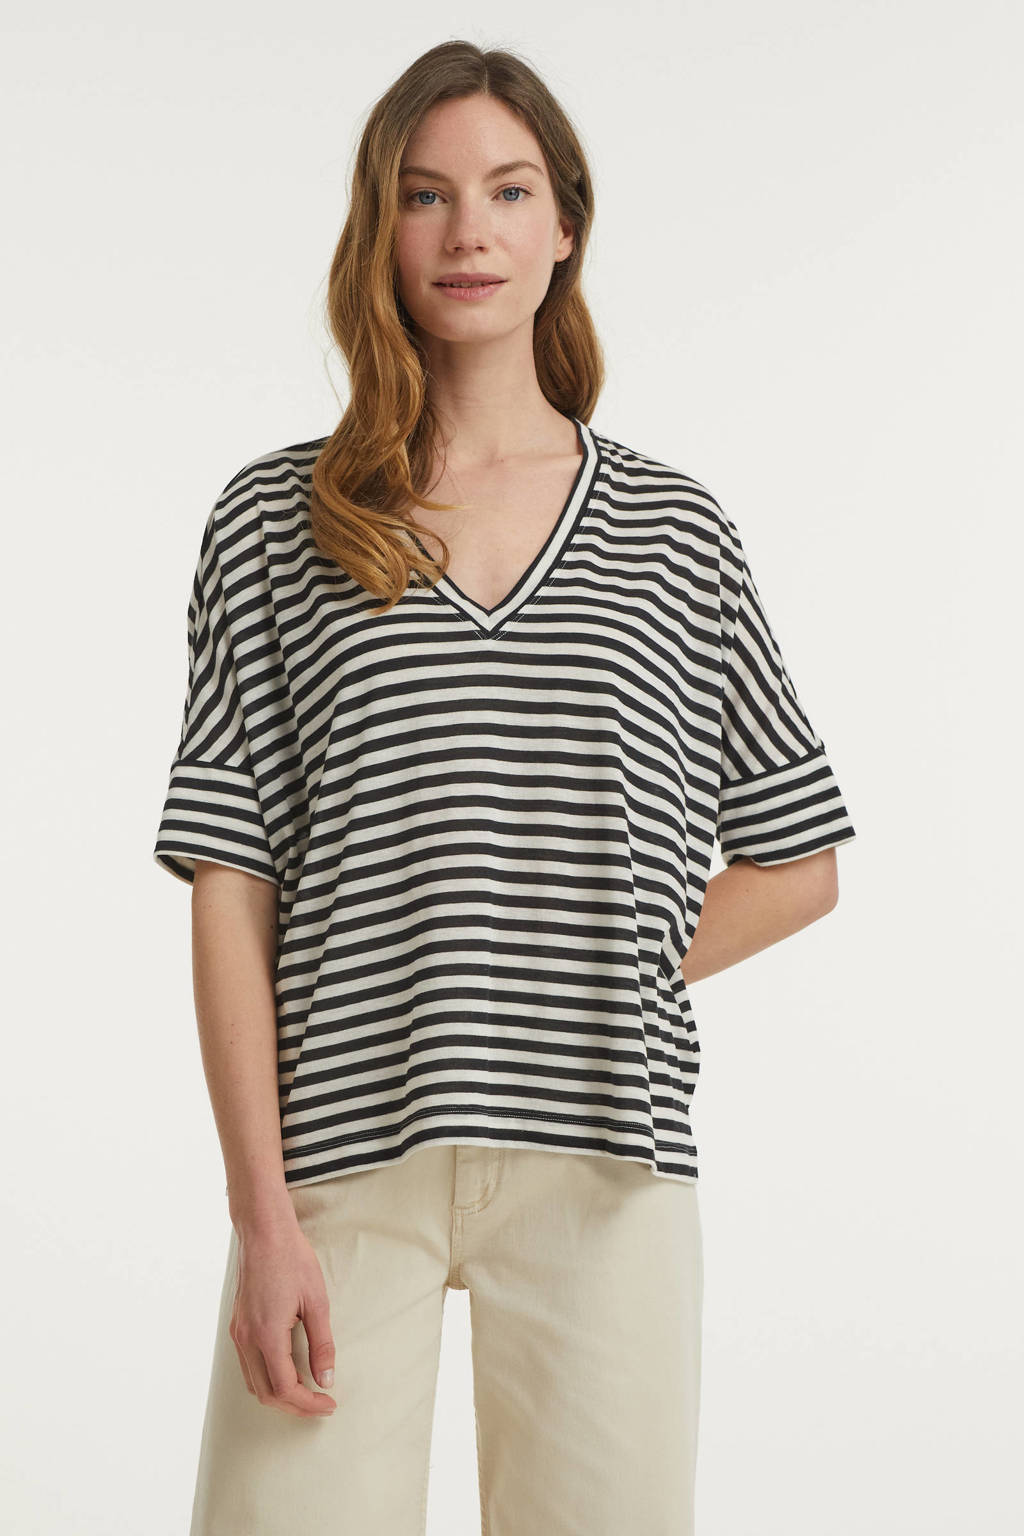 Inwear gestreept T-shirt Ursula wit/zwart, Wit/zwart